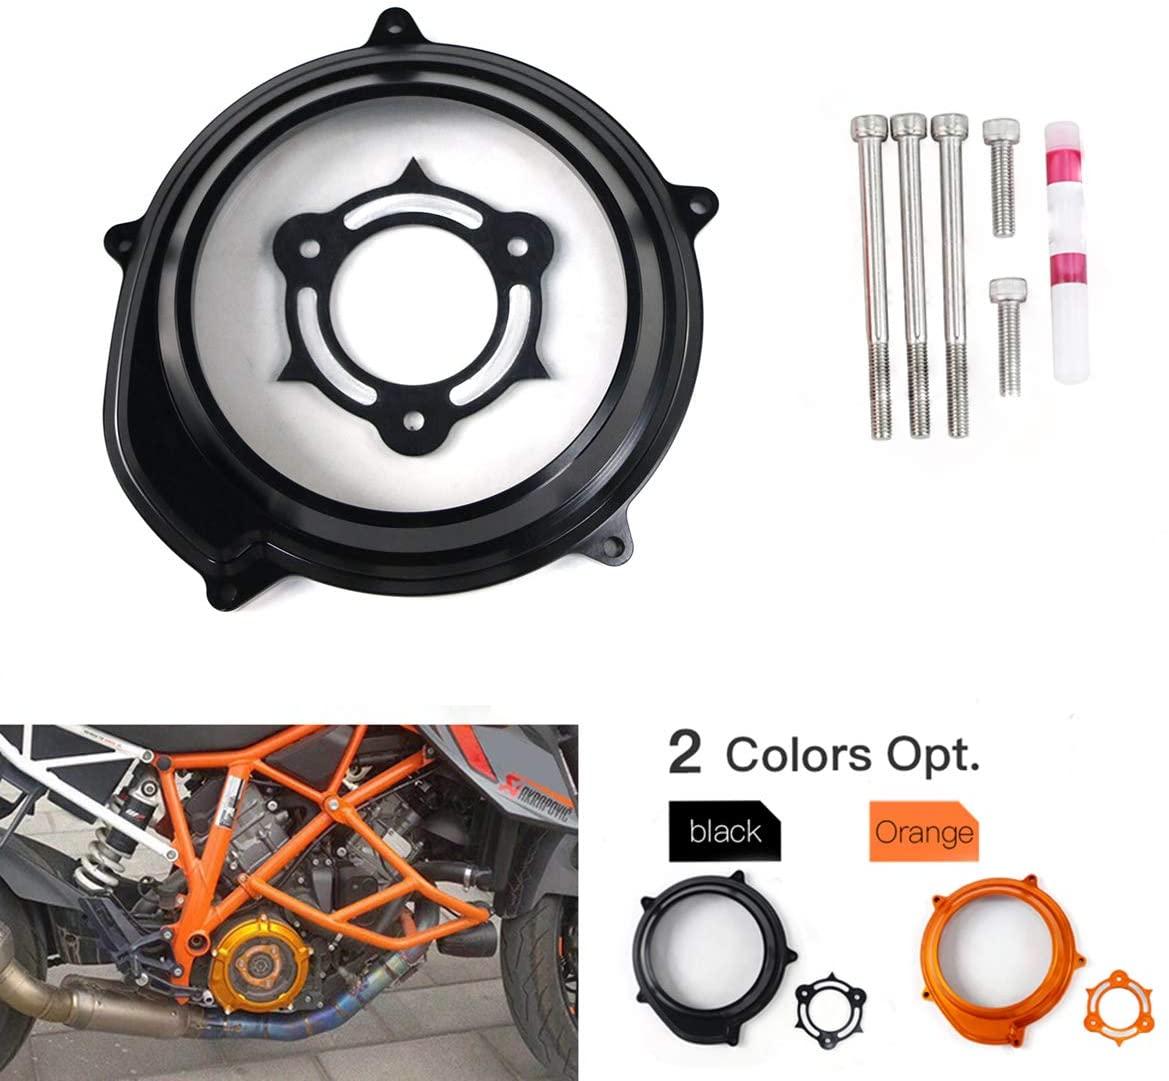 COPART Clutch Cover for KTM, Transparent Clutch Protector Cover Pressure Spring For KTM 1290 Superduke GT R 1090 1190 1050 Adventure